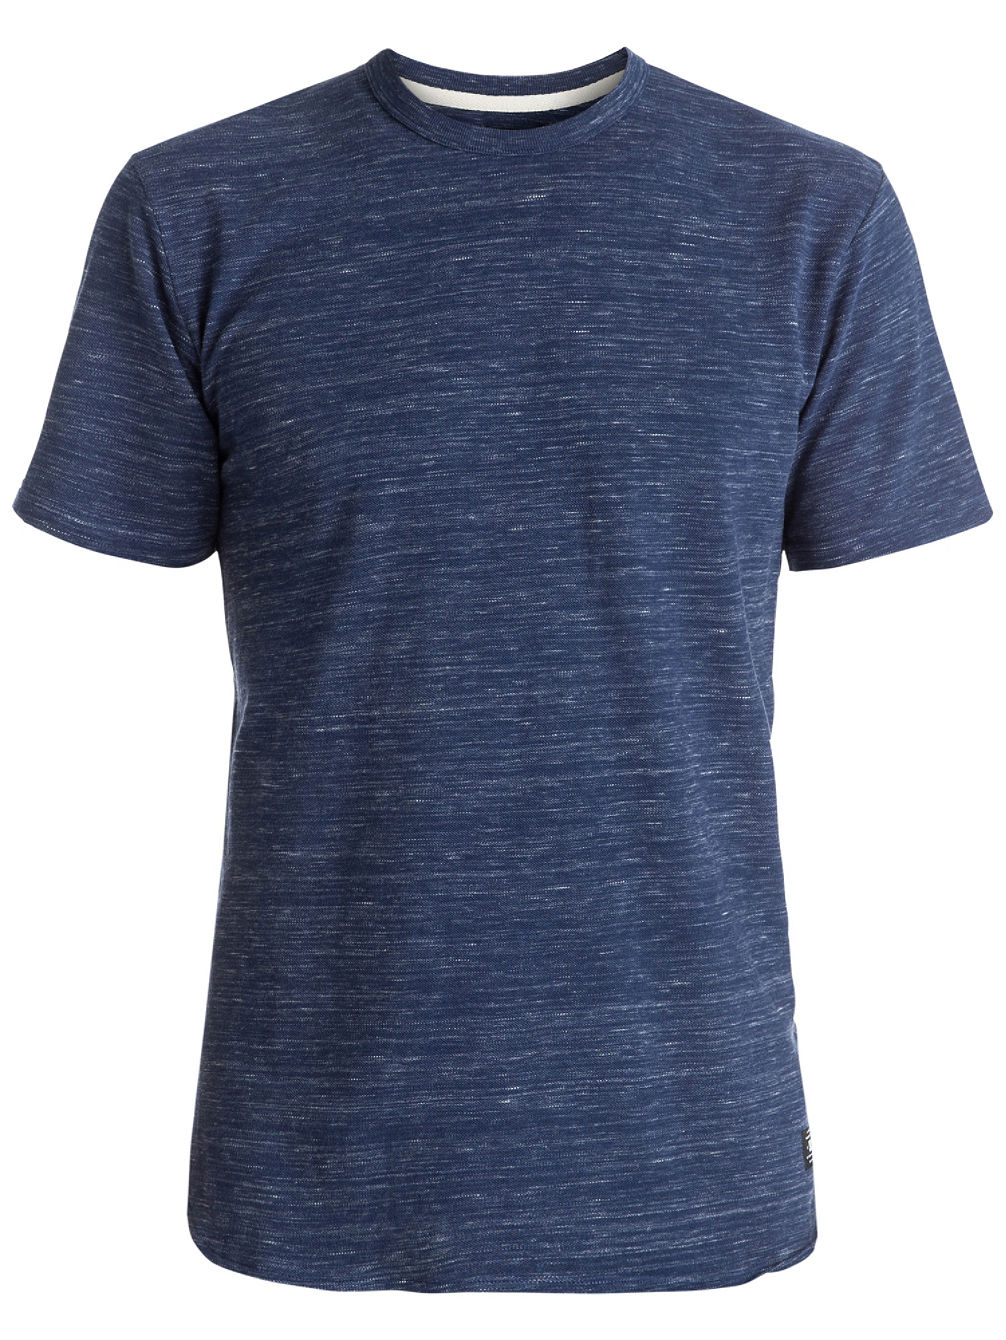 dc-seeley-t-shirt